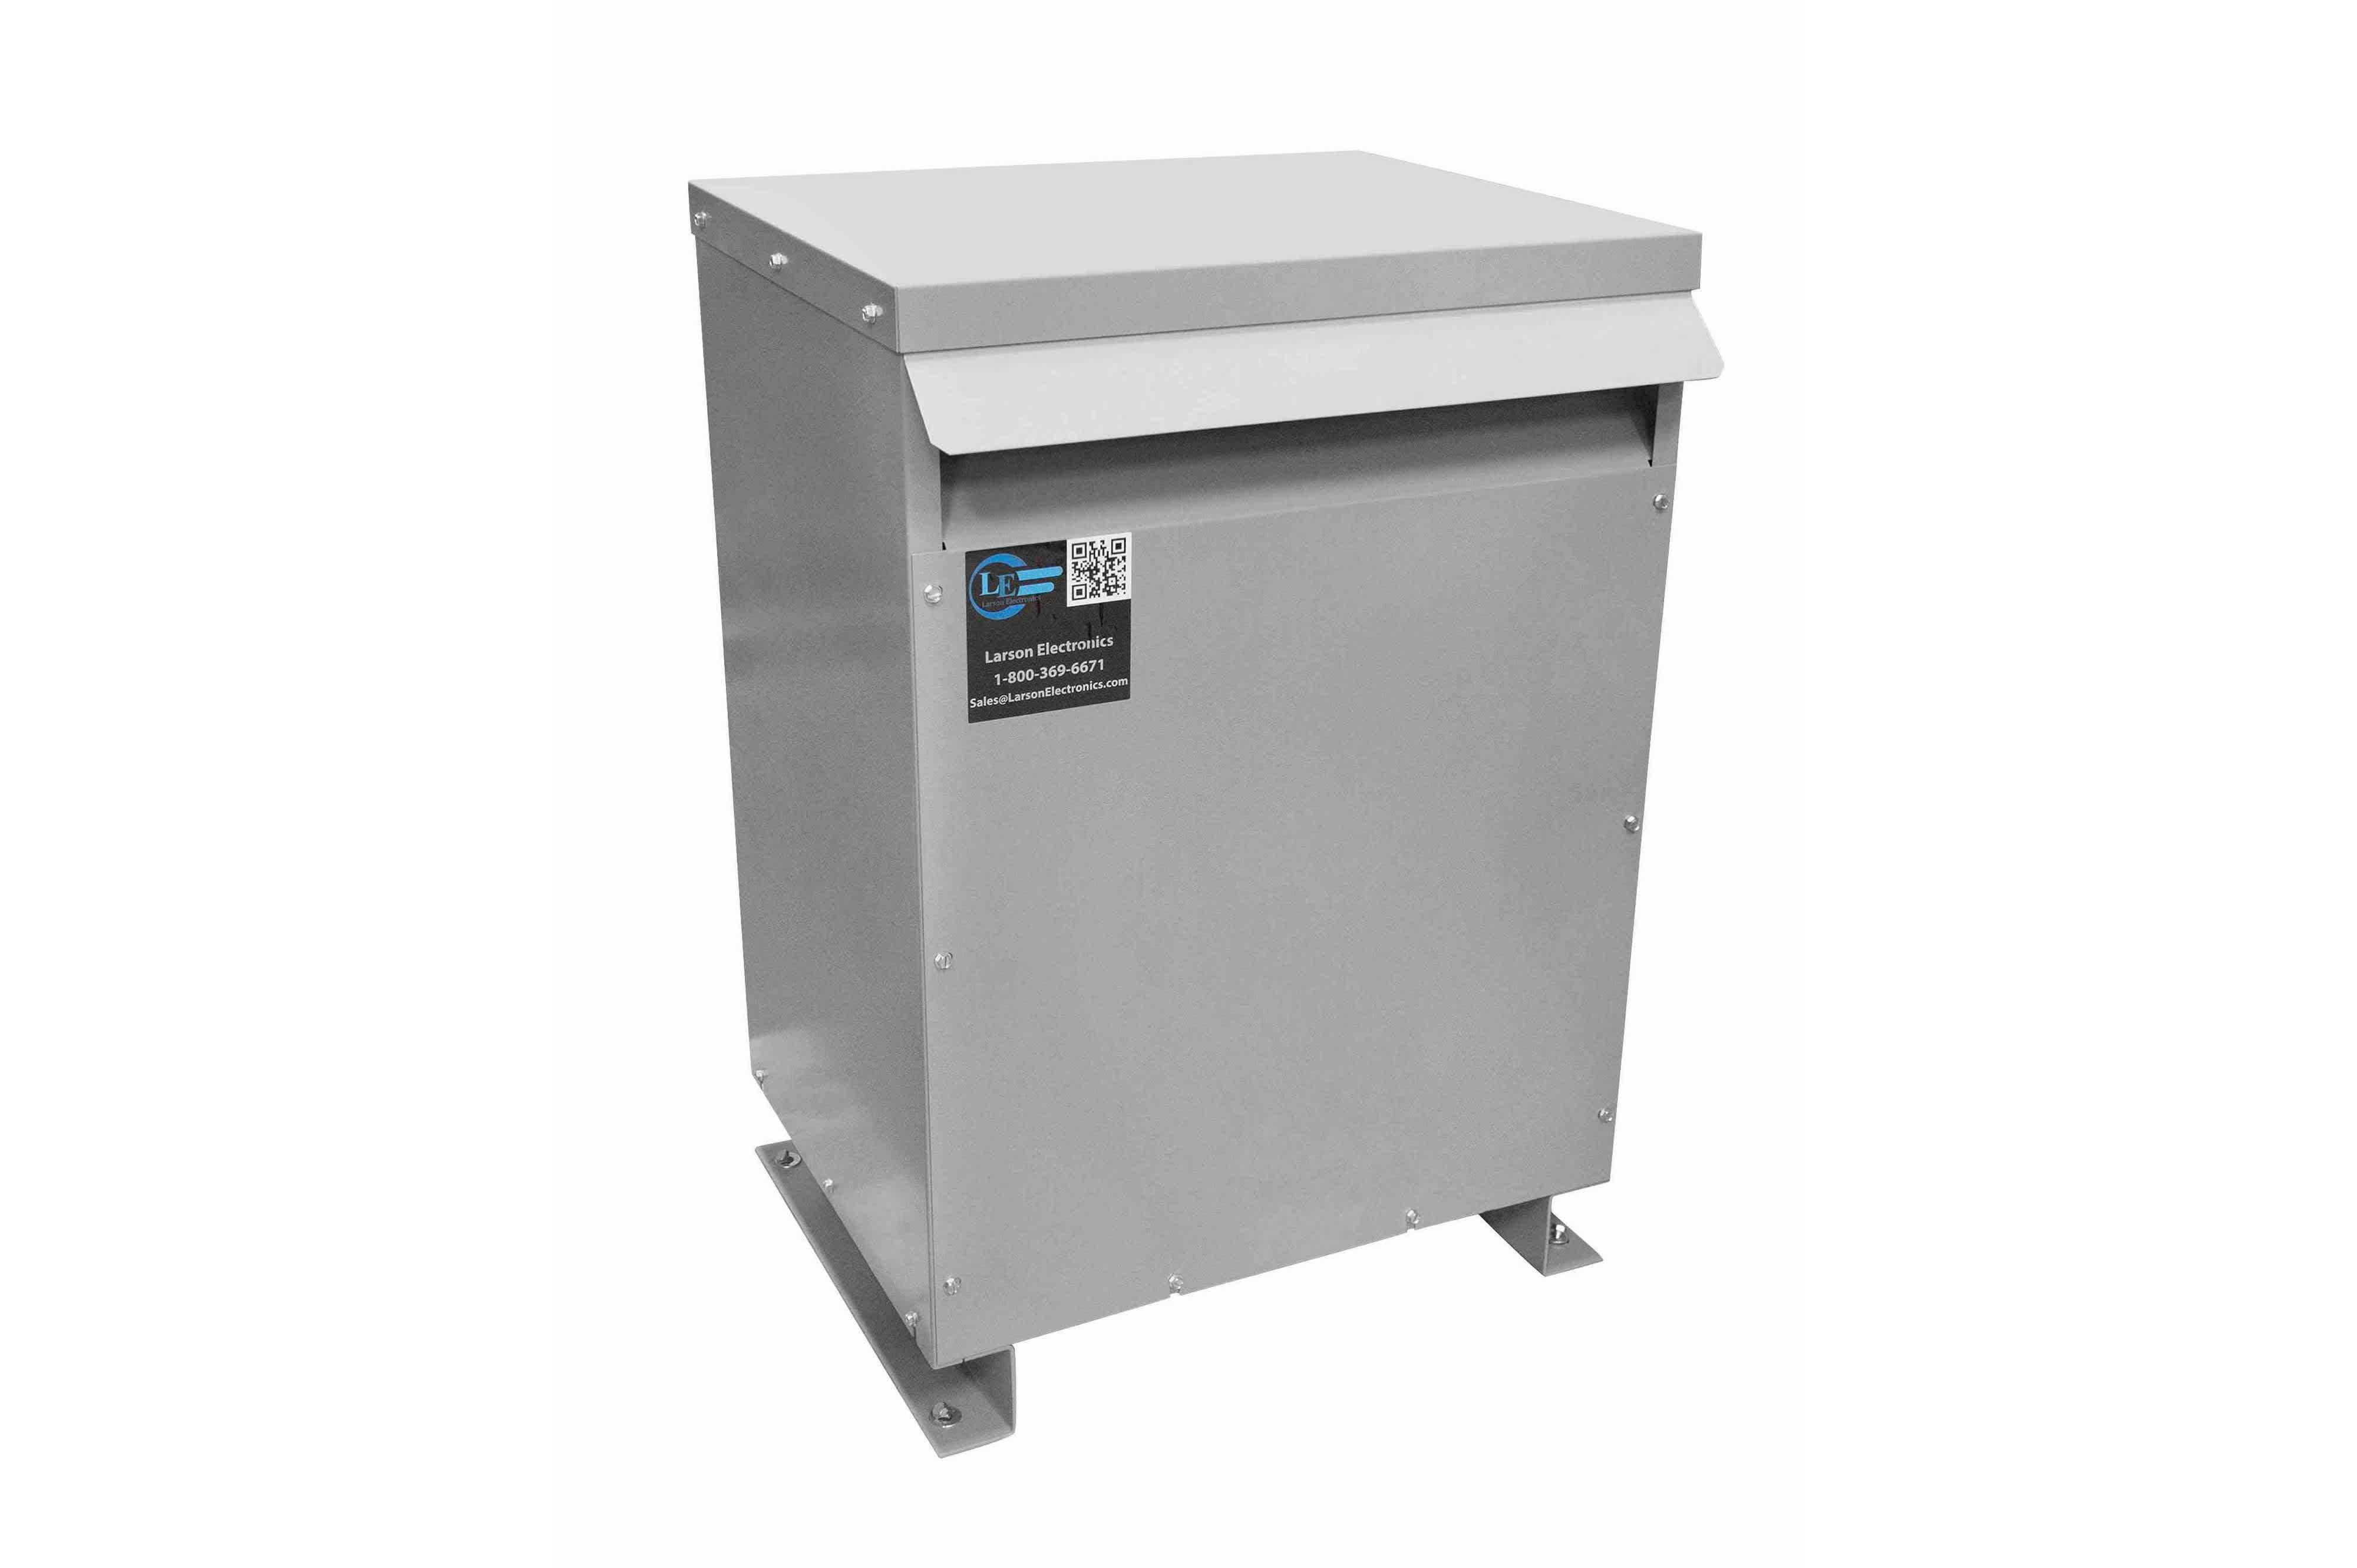 167 kVA 3PH Isolation Transformer, 208V Wye Primary, 380V Delta Secondary, N3R, Ventilated, 60 Hz